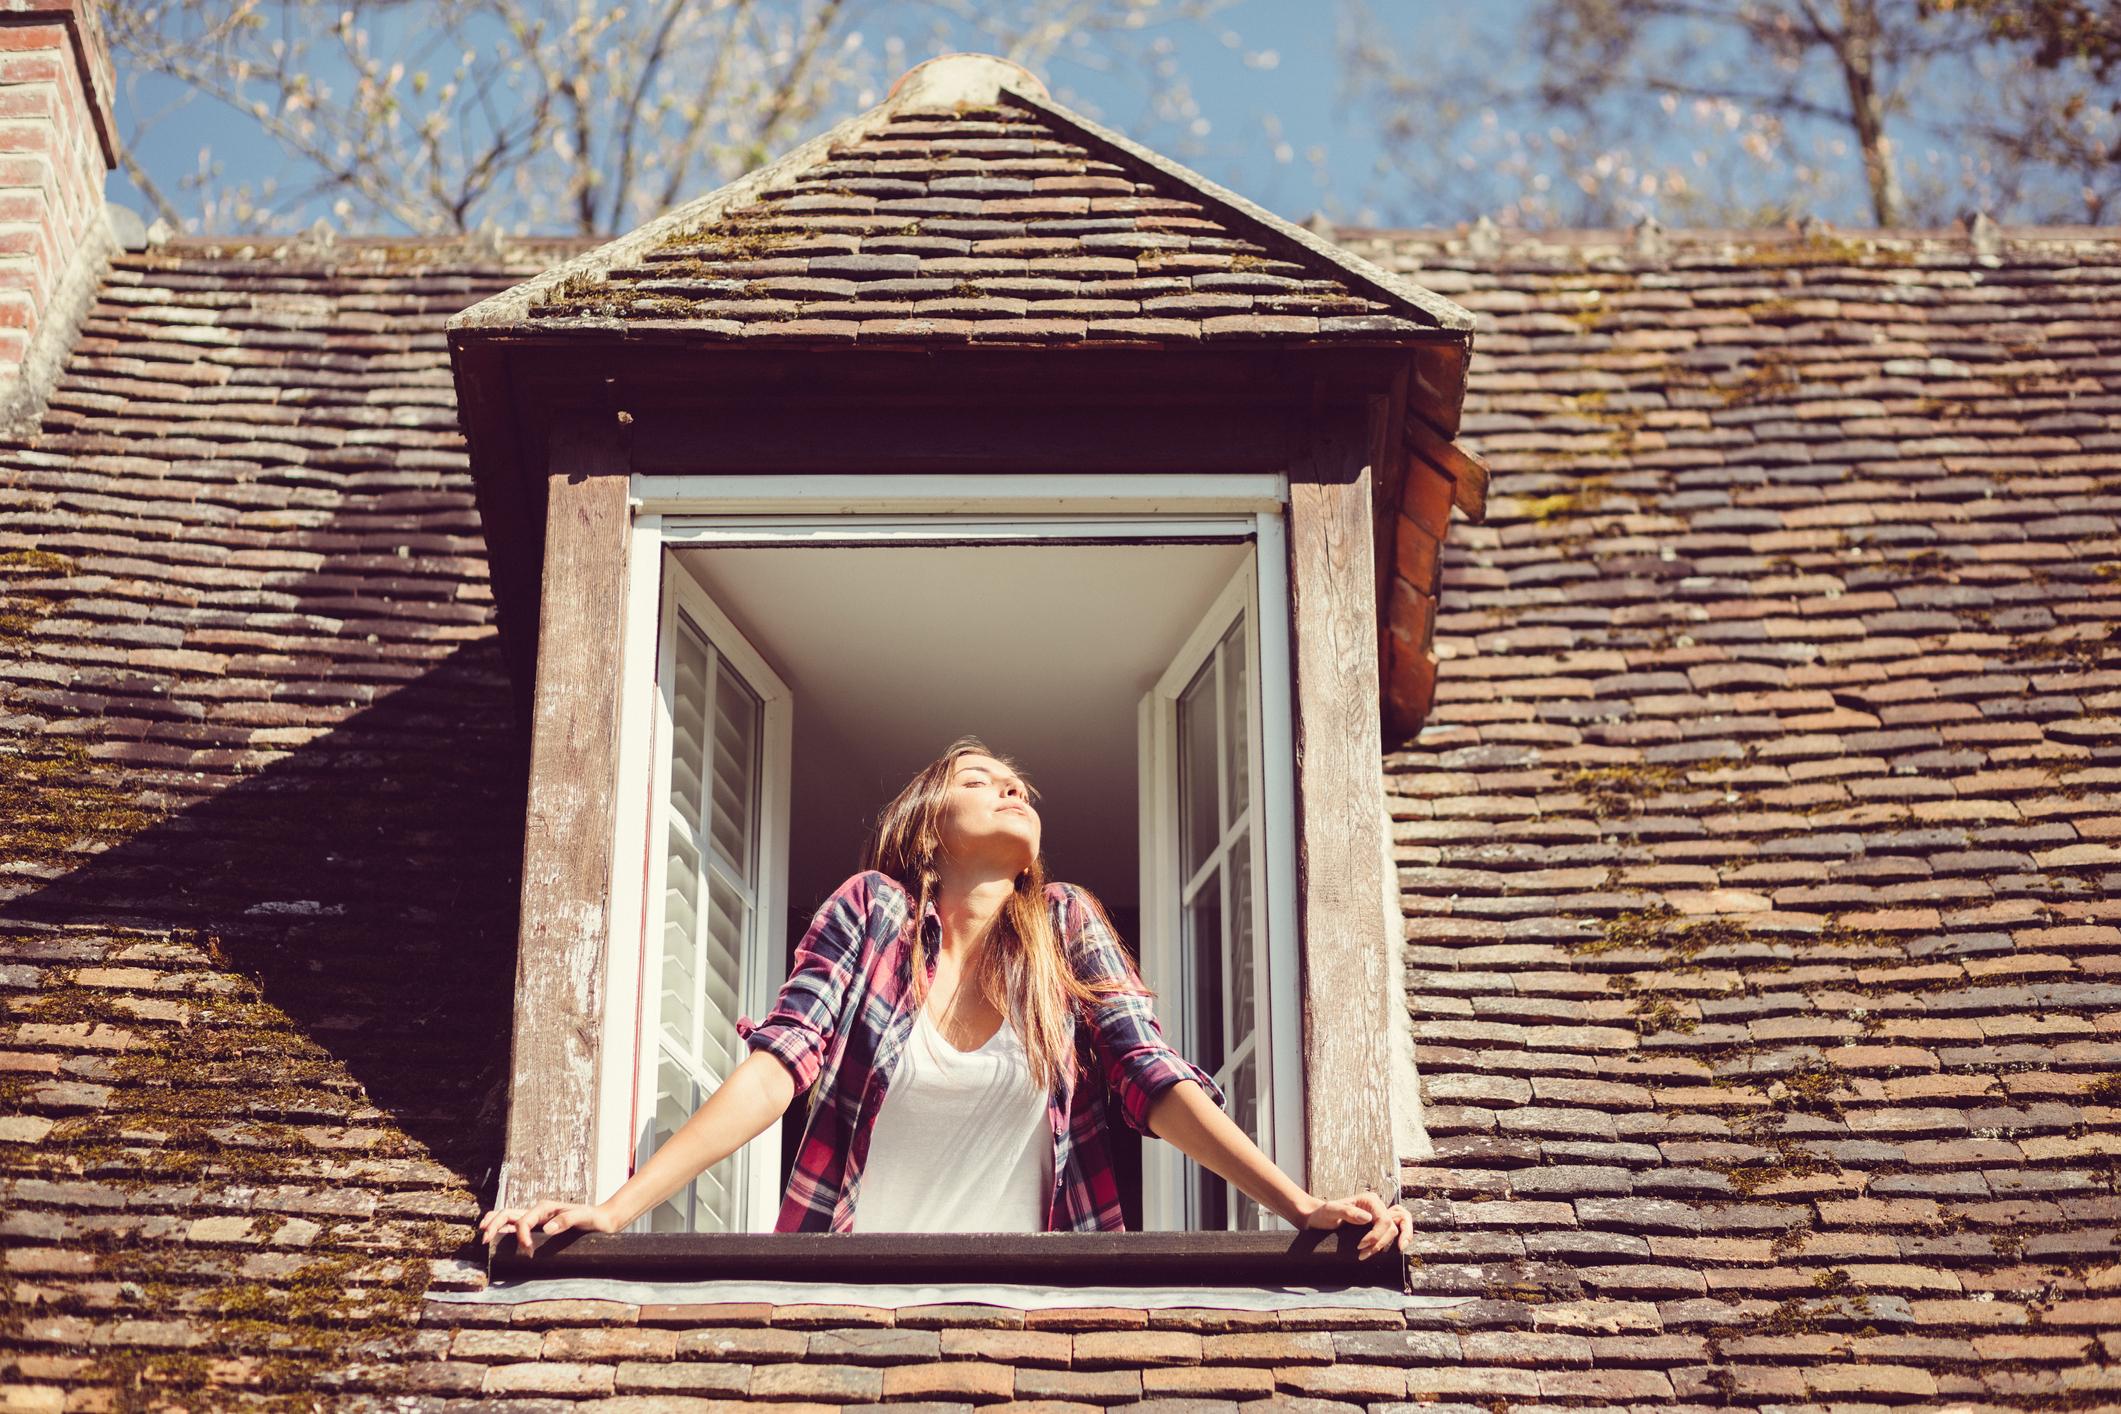 Woman Enjoying the Sunshine from a 2nd Story Window